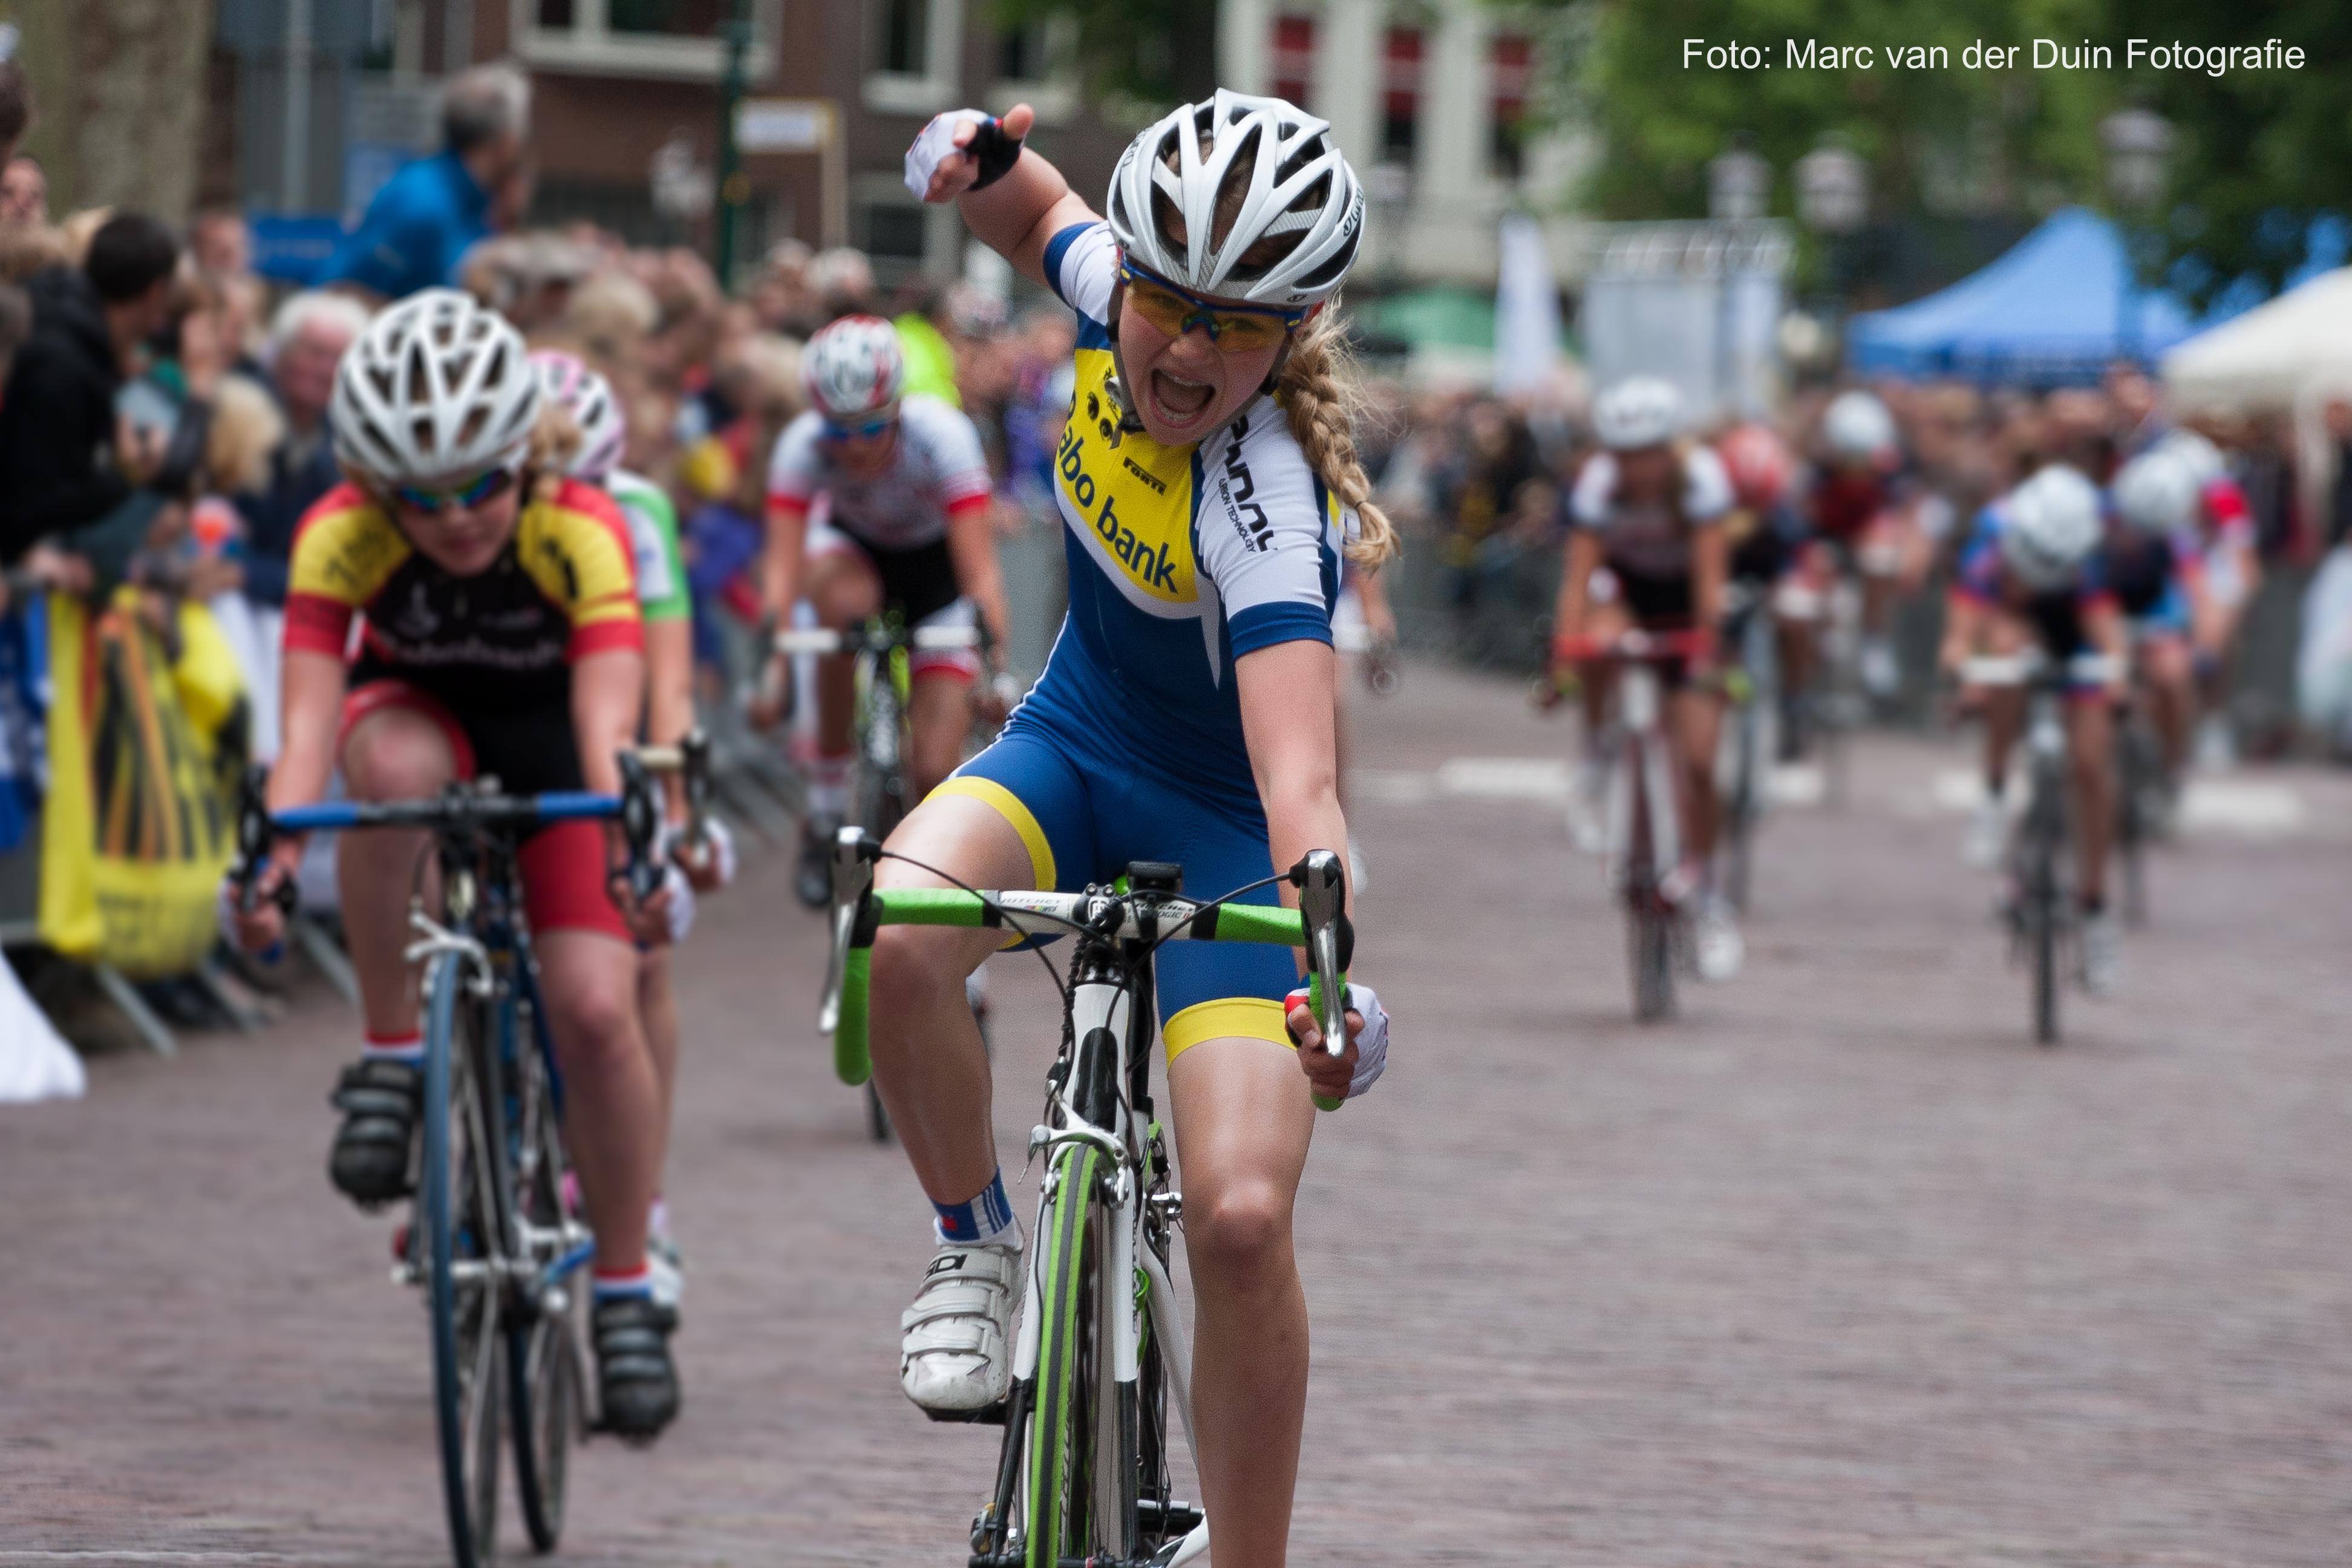 Maike van der Duin Nederlands kampioen wielrennen